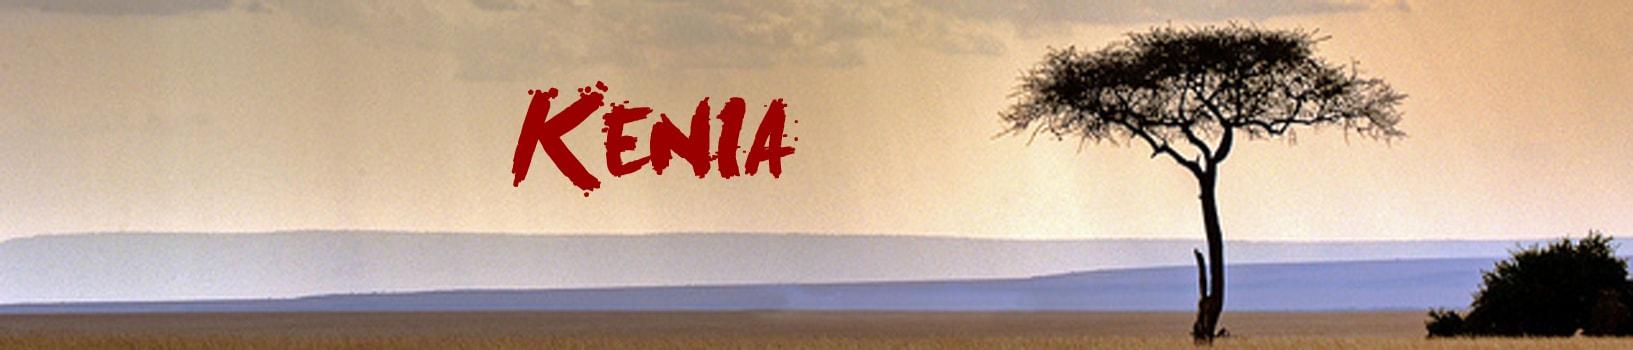 viaje-kenia